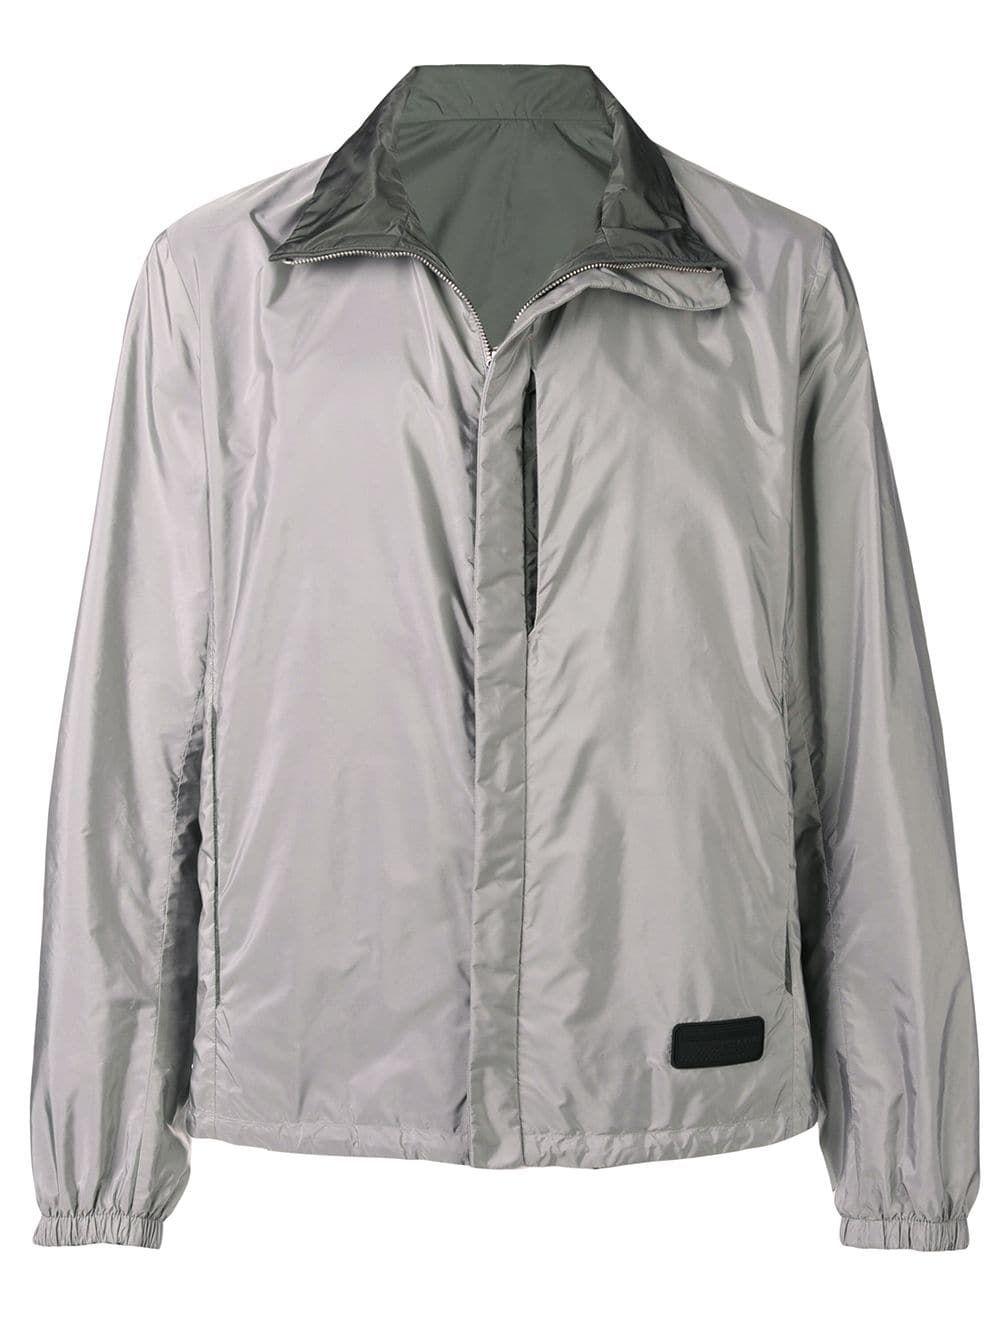 062ed097 Prada technical shirt jacket - Grey in 2019 | Products | Jackets ...